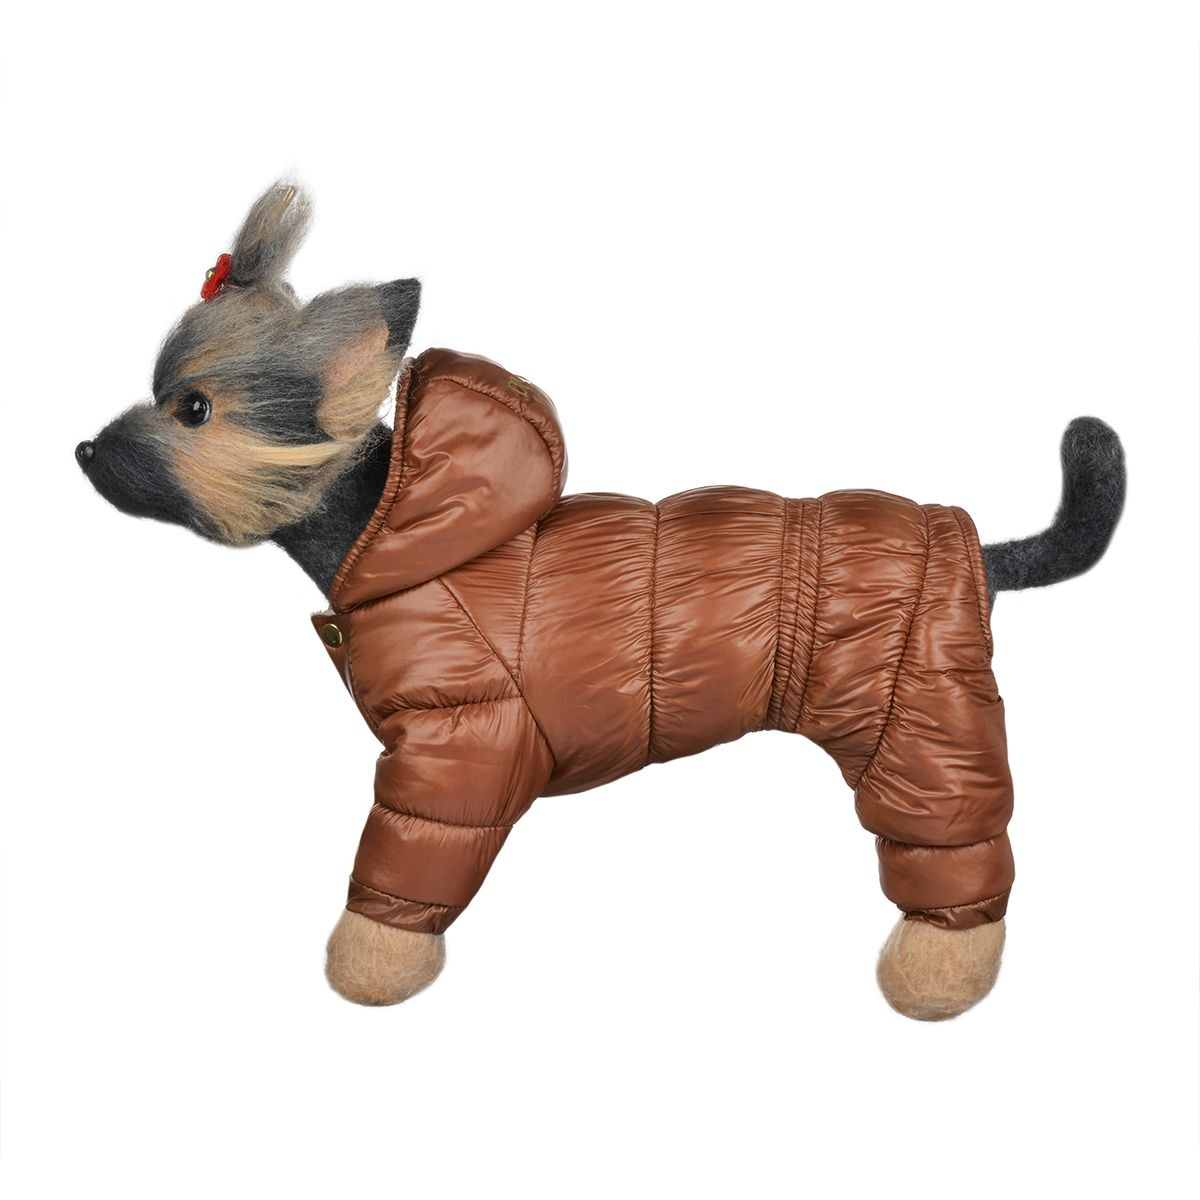 "Пуховик для собак Dogmoda ""Тренд"", зимний, унисекс, цвет: коричневый, бежевый. Размер 1 (S)"